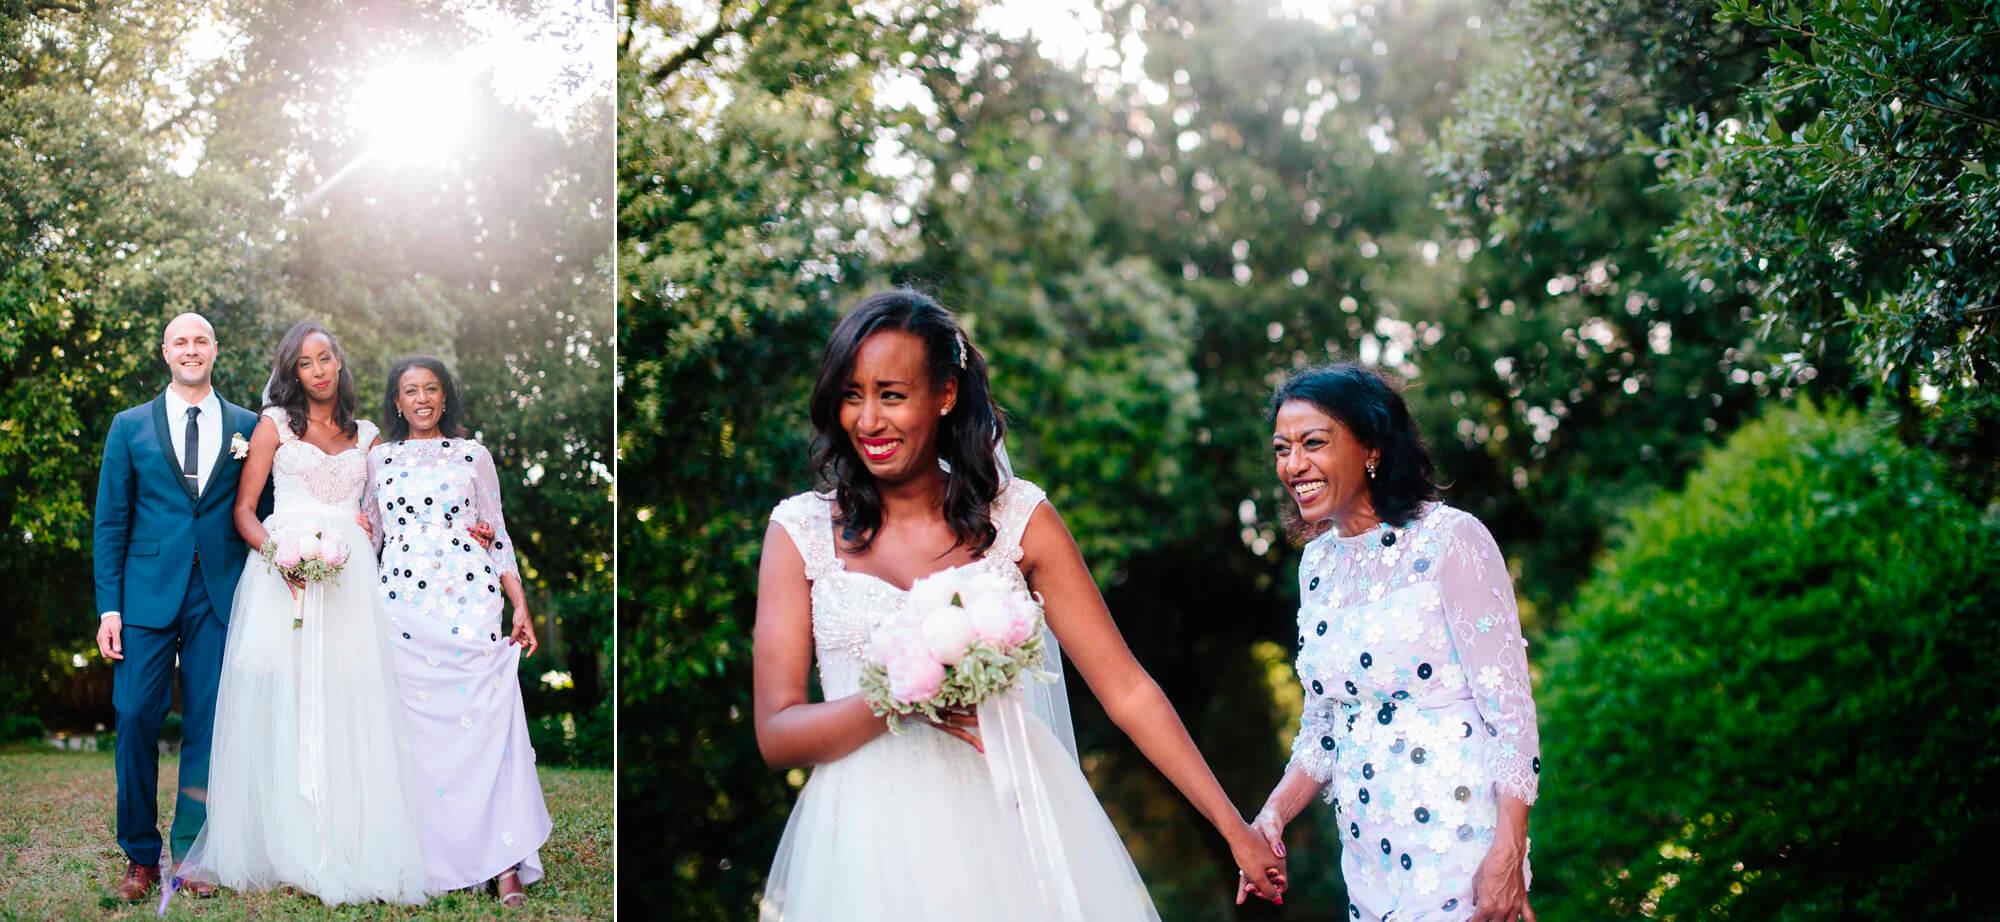 079-sorrento-wedding-photographer.jpg